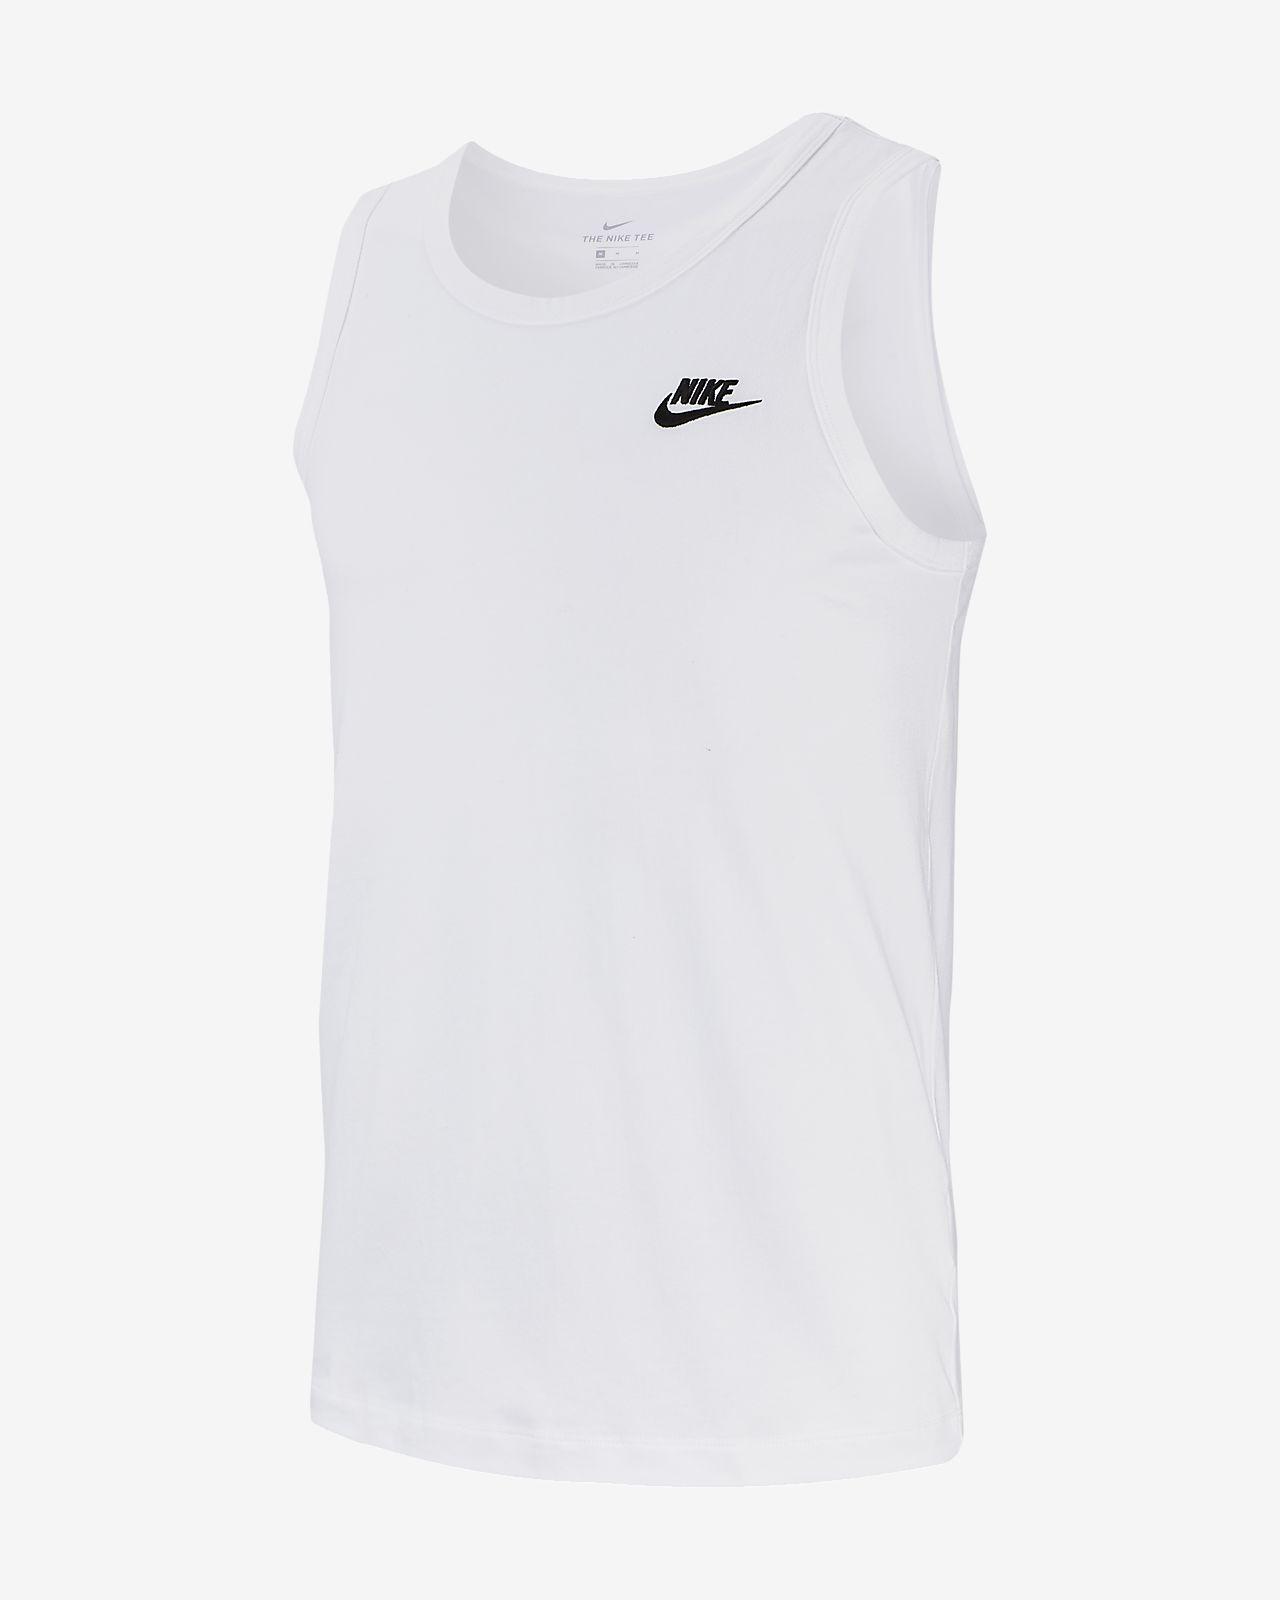 Męska koszulka bez rękawów Nike Sportswear